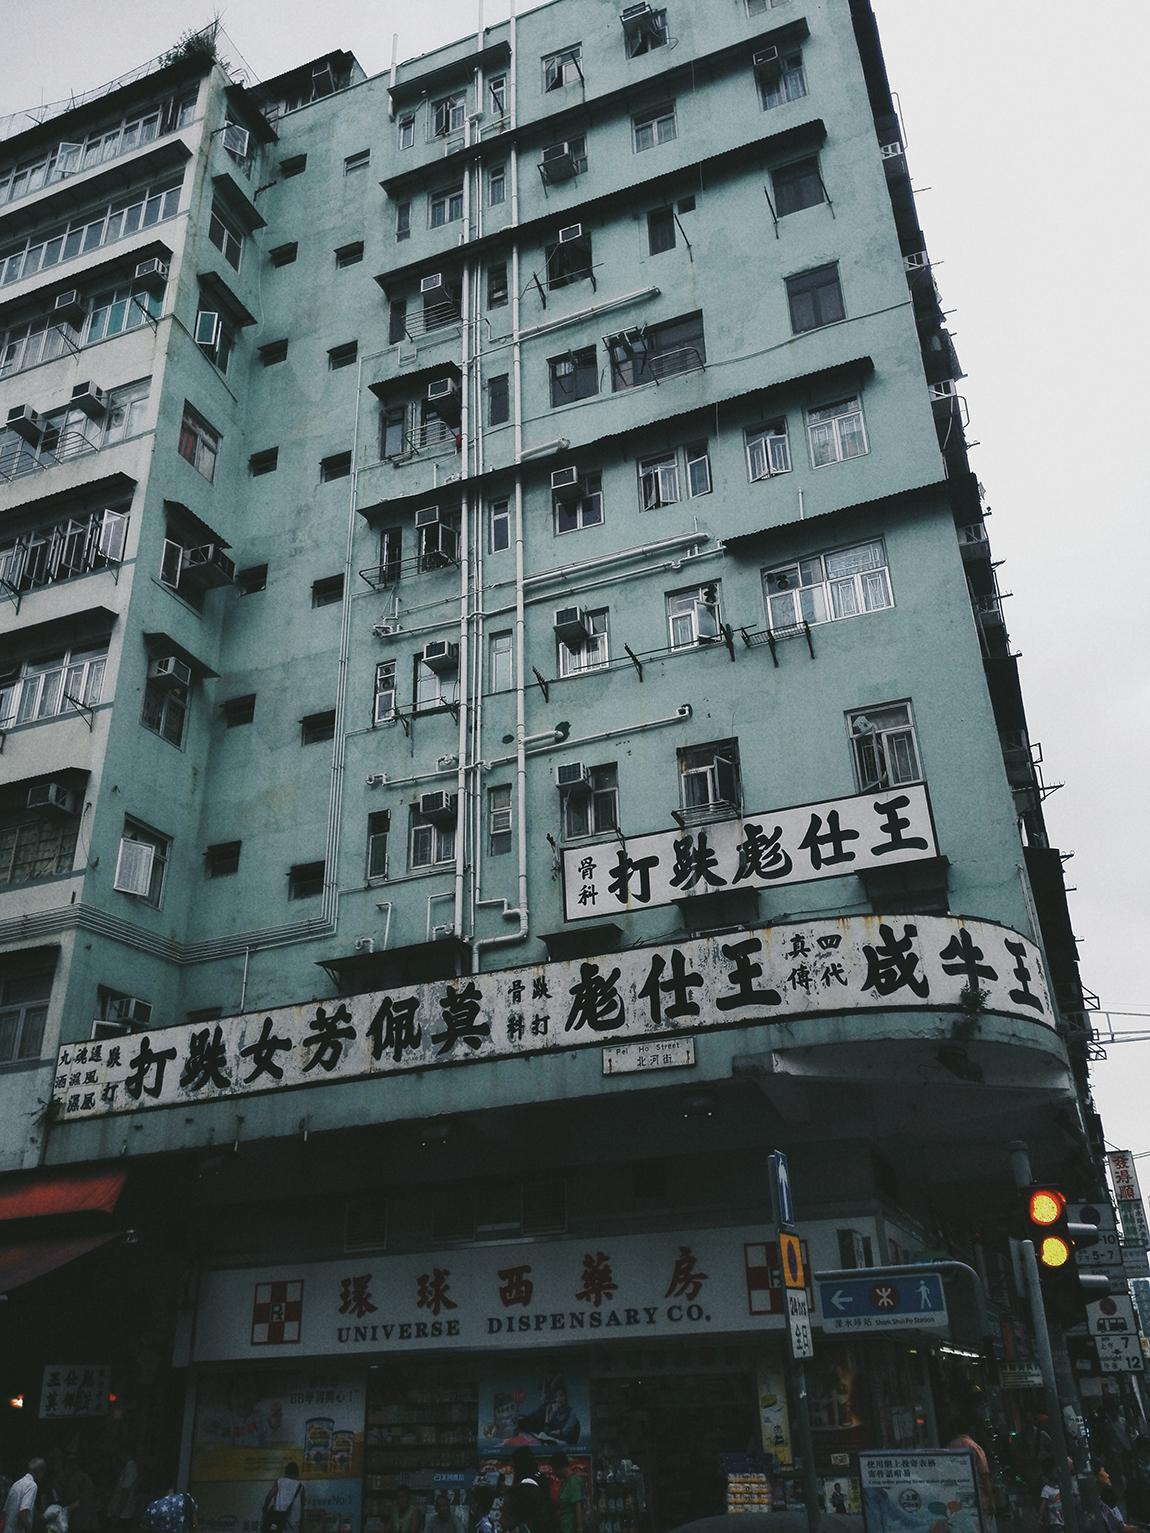 Sham Shui Po 深水埗 – Part I